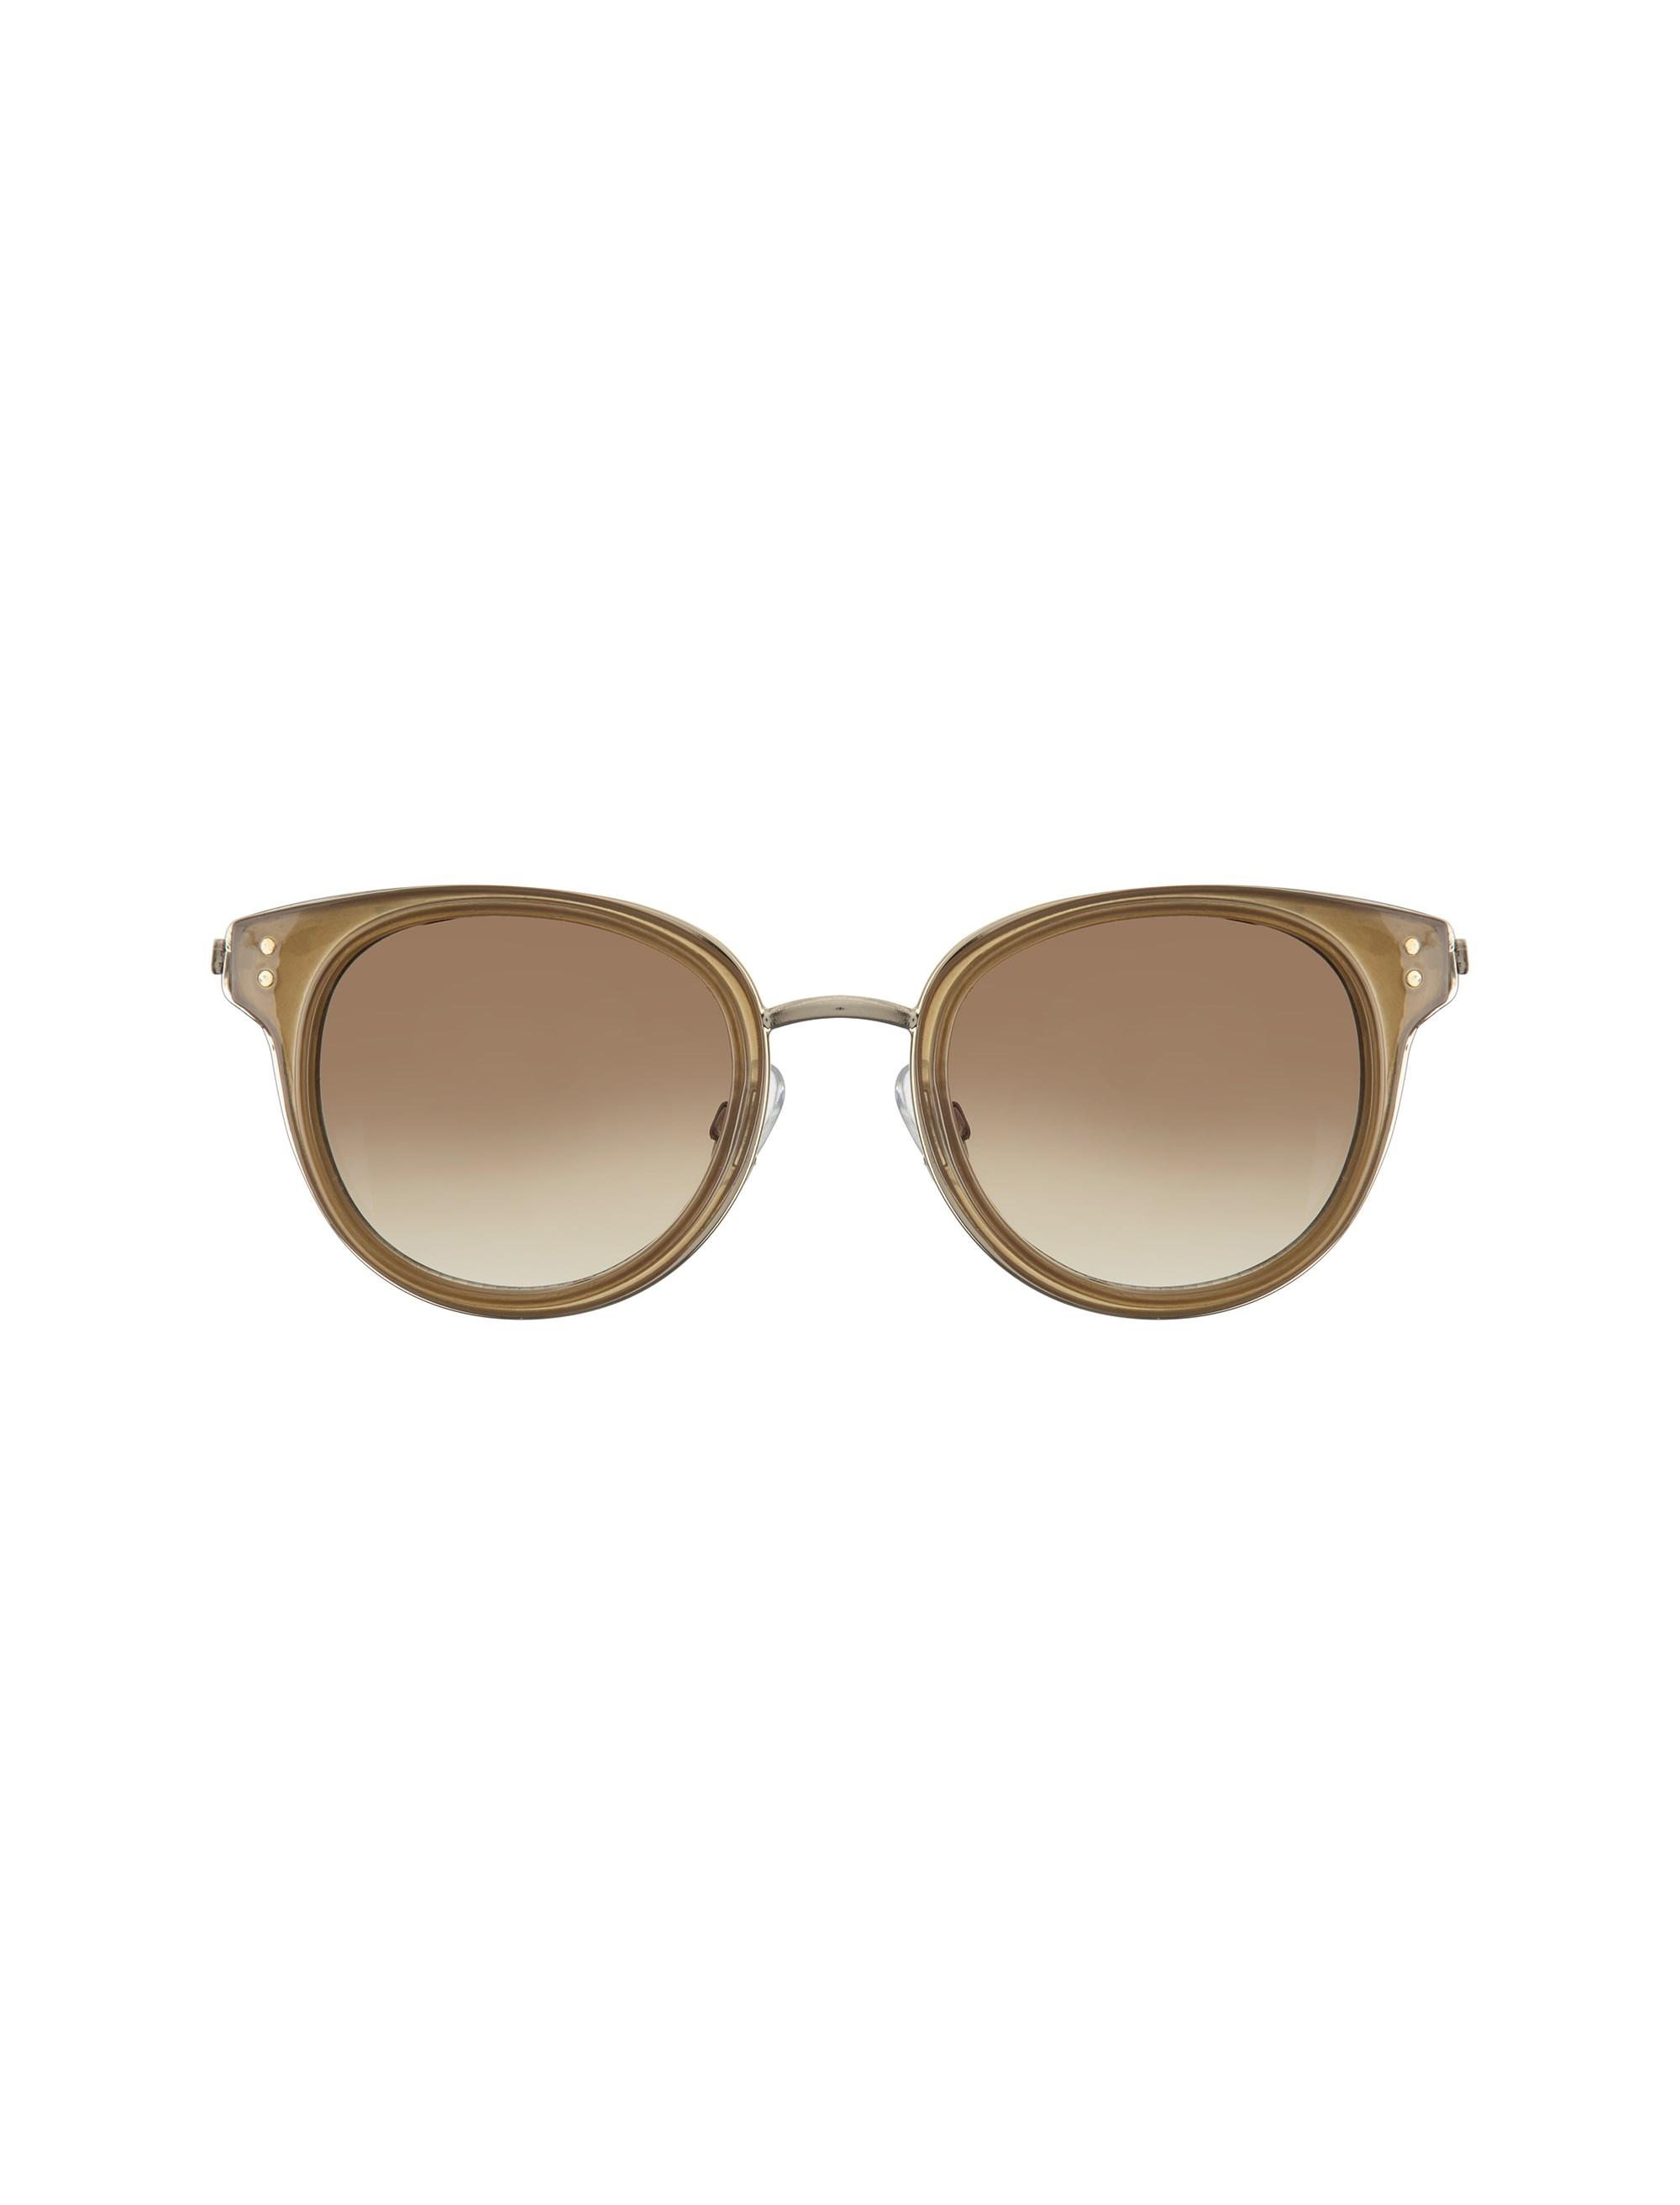 قیمت عینک آفتابی پنتوس زنانه - مانگو